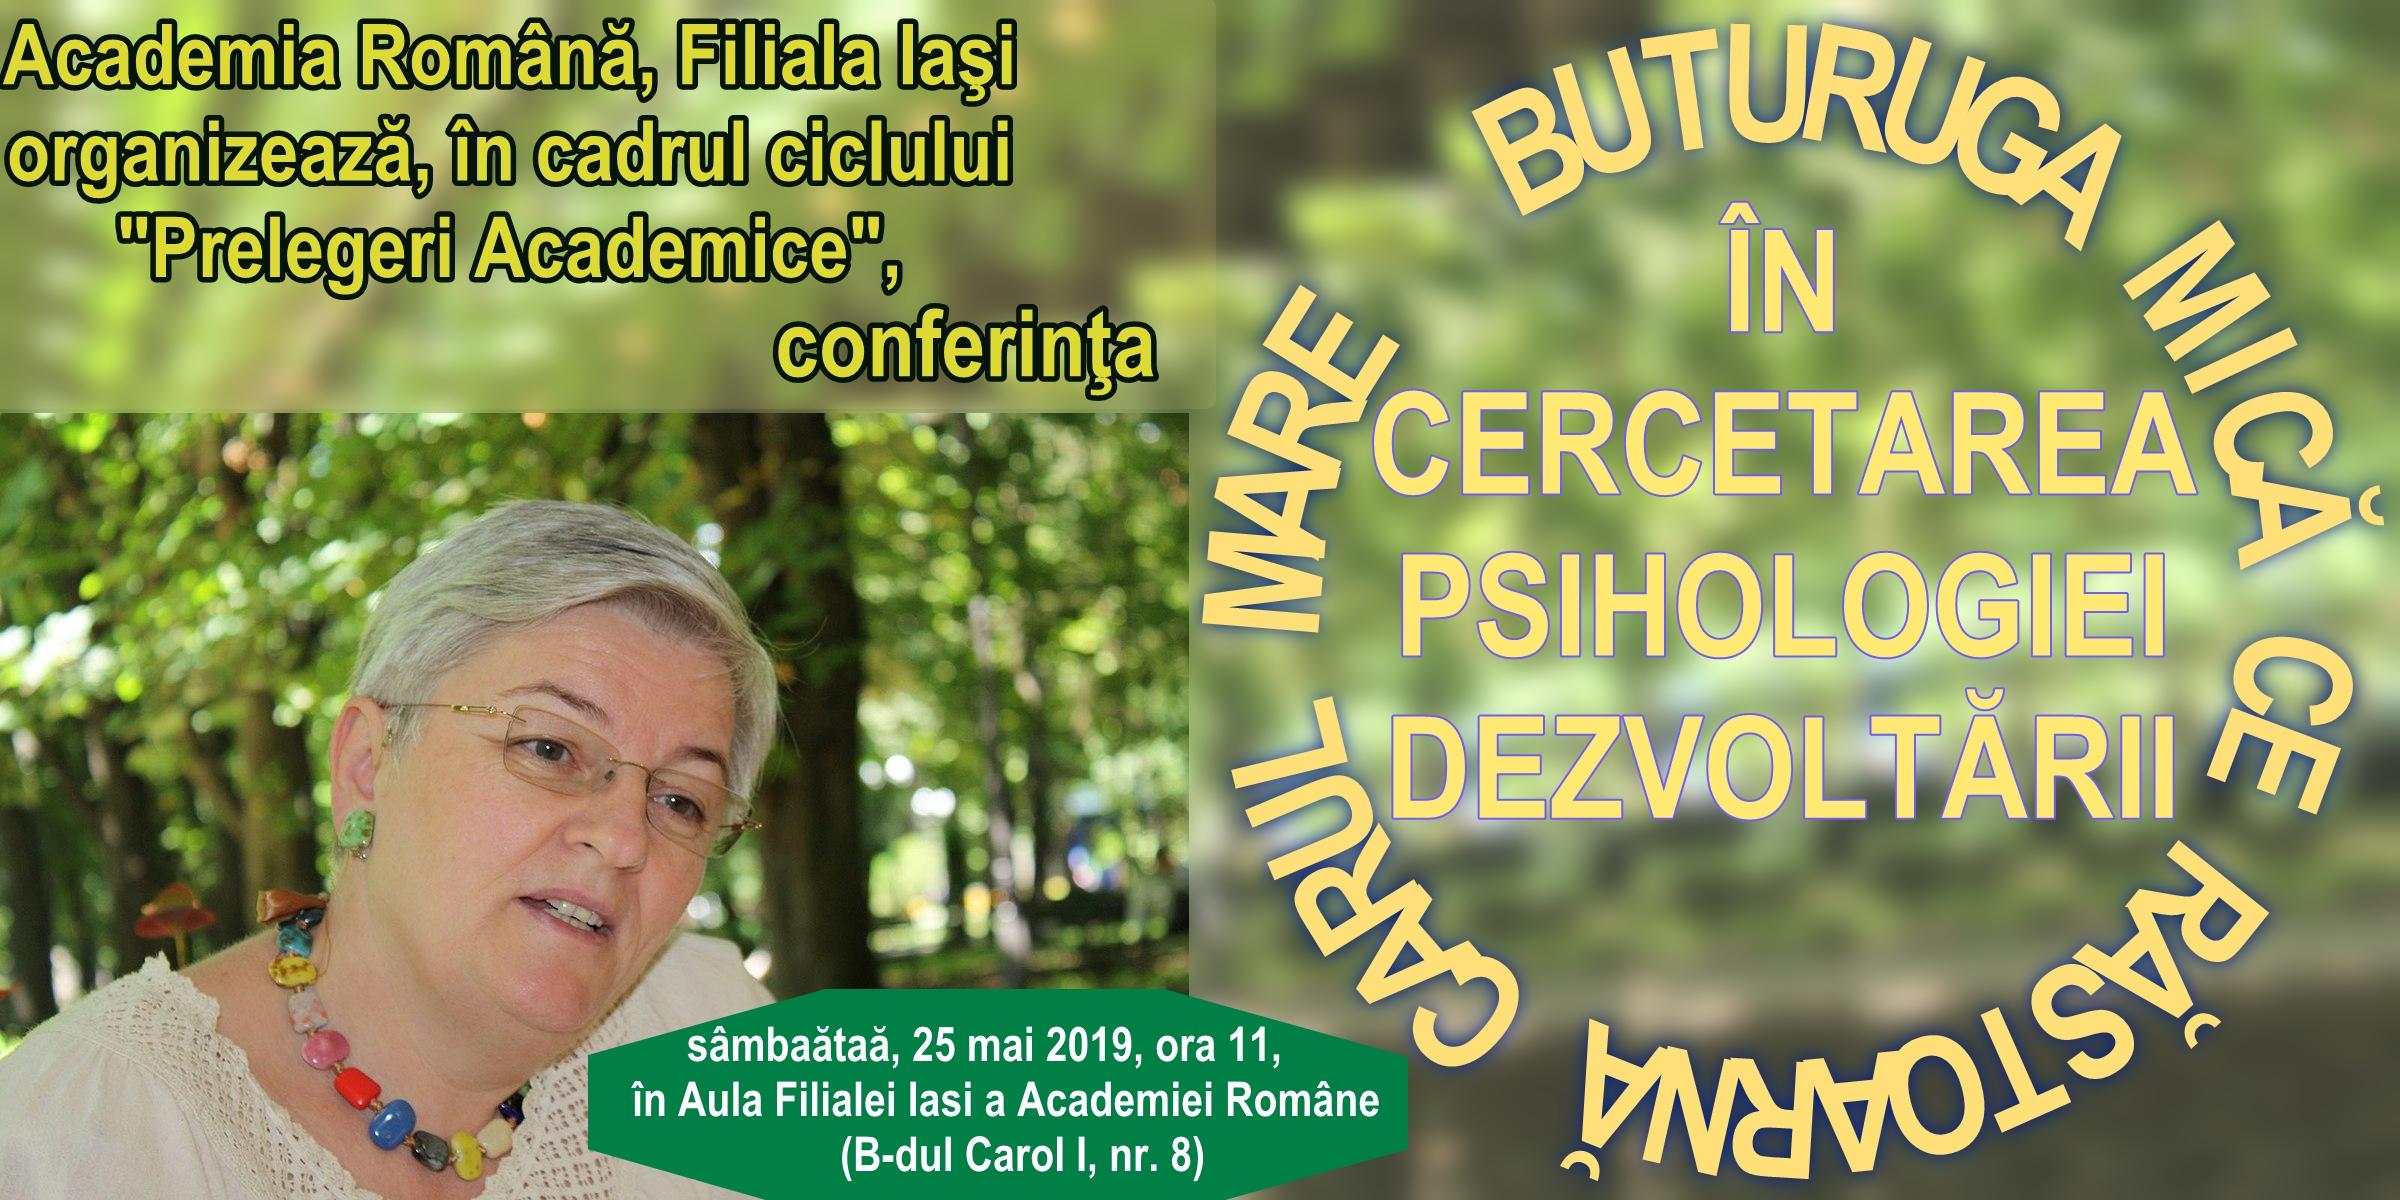 Conferinţa, prof. dr. Luminiţa Iacob